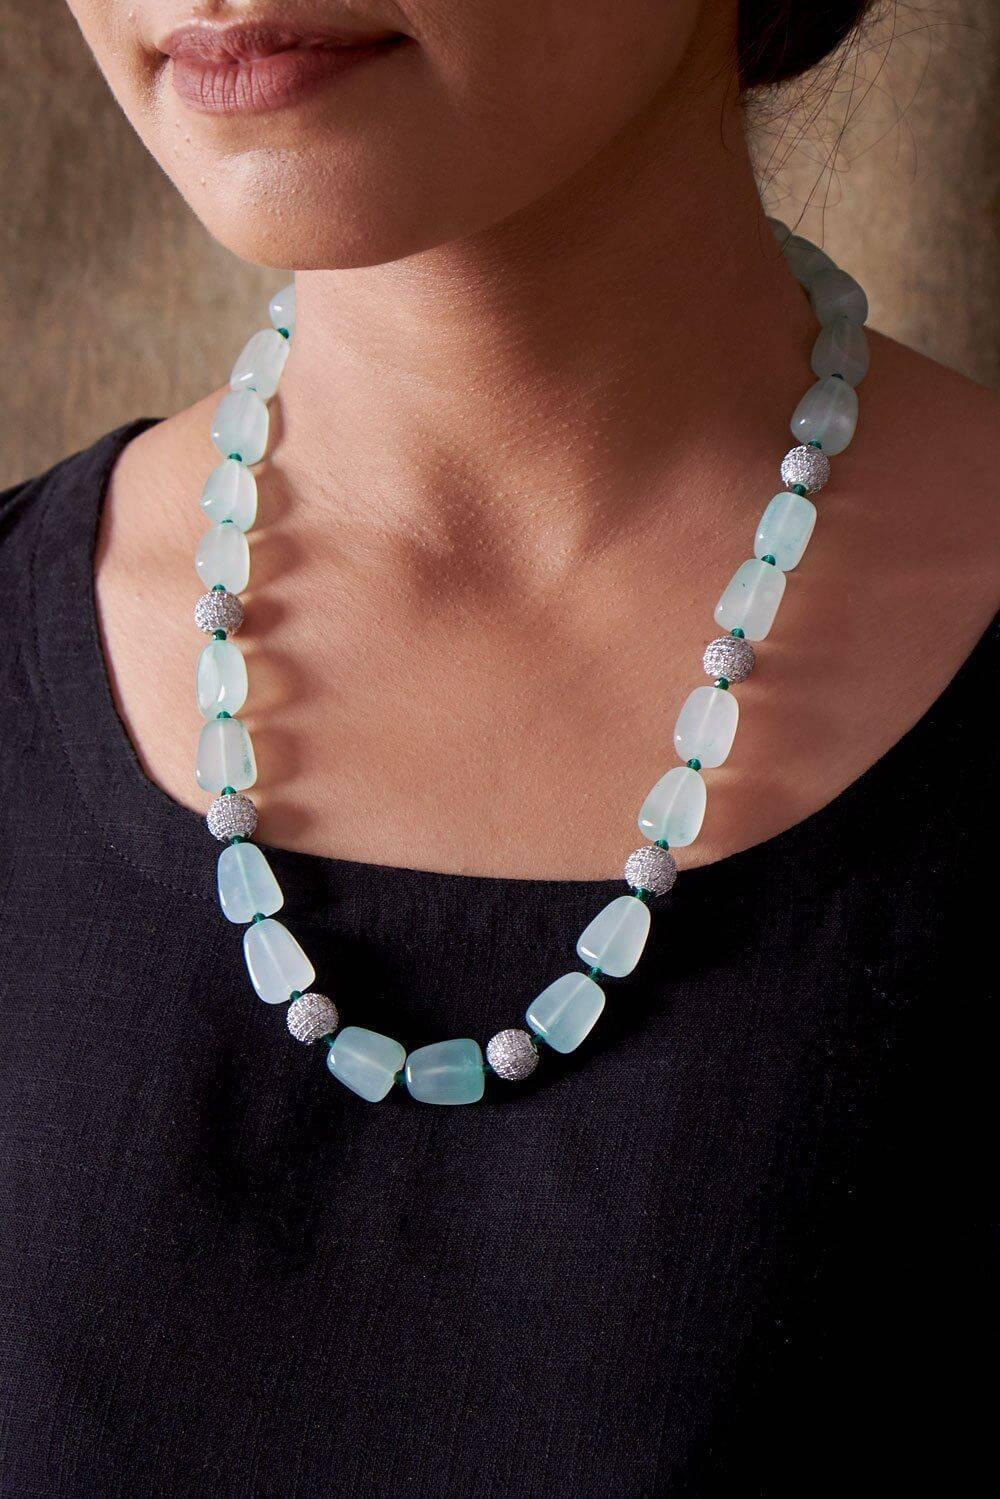 Studded Beads Necklace